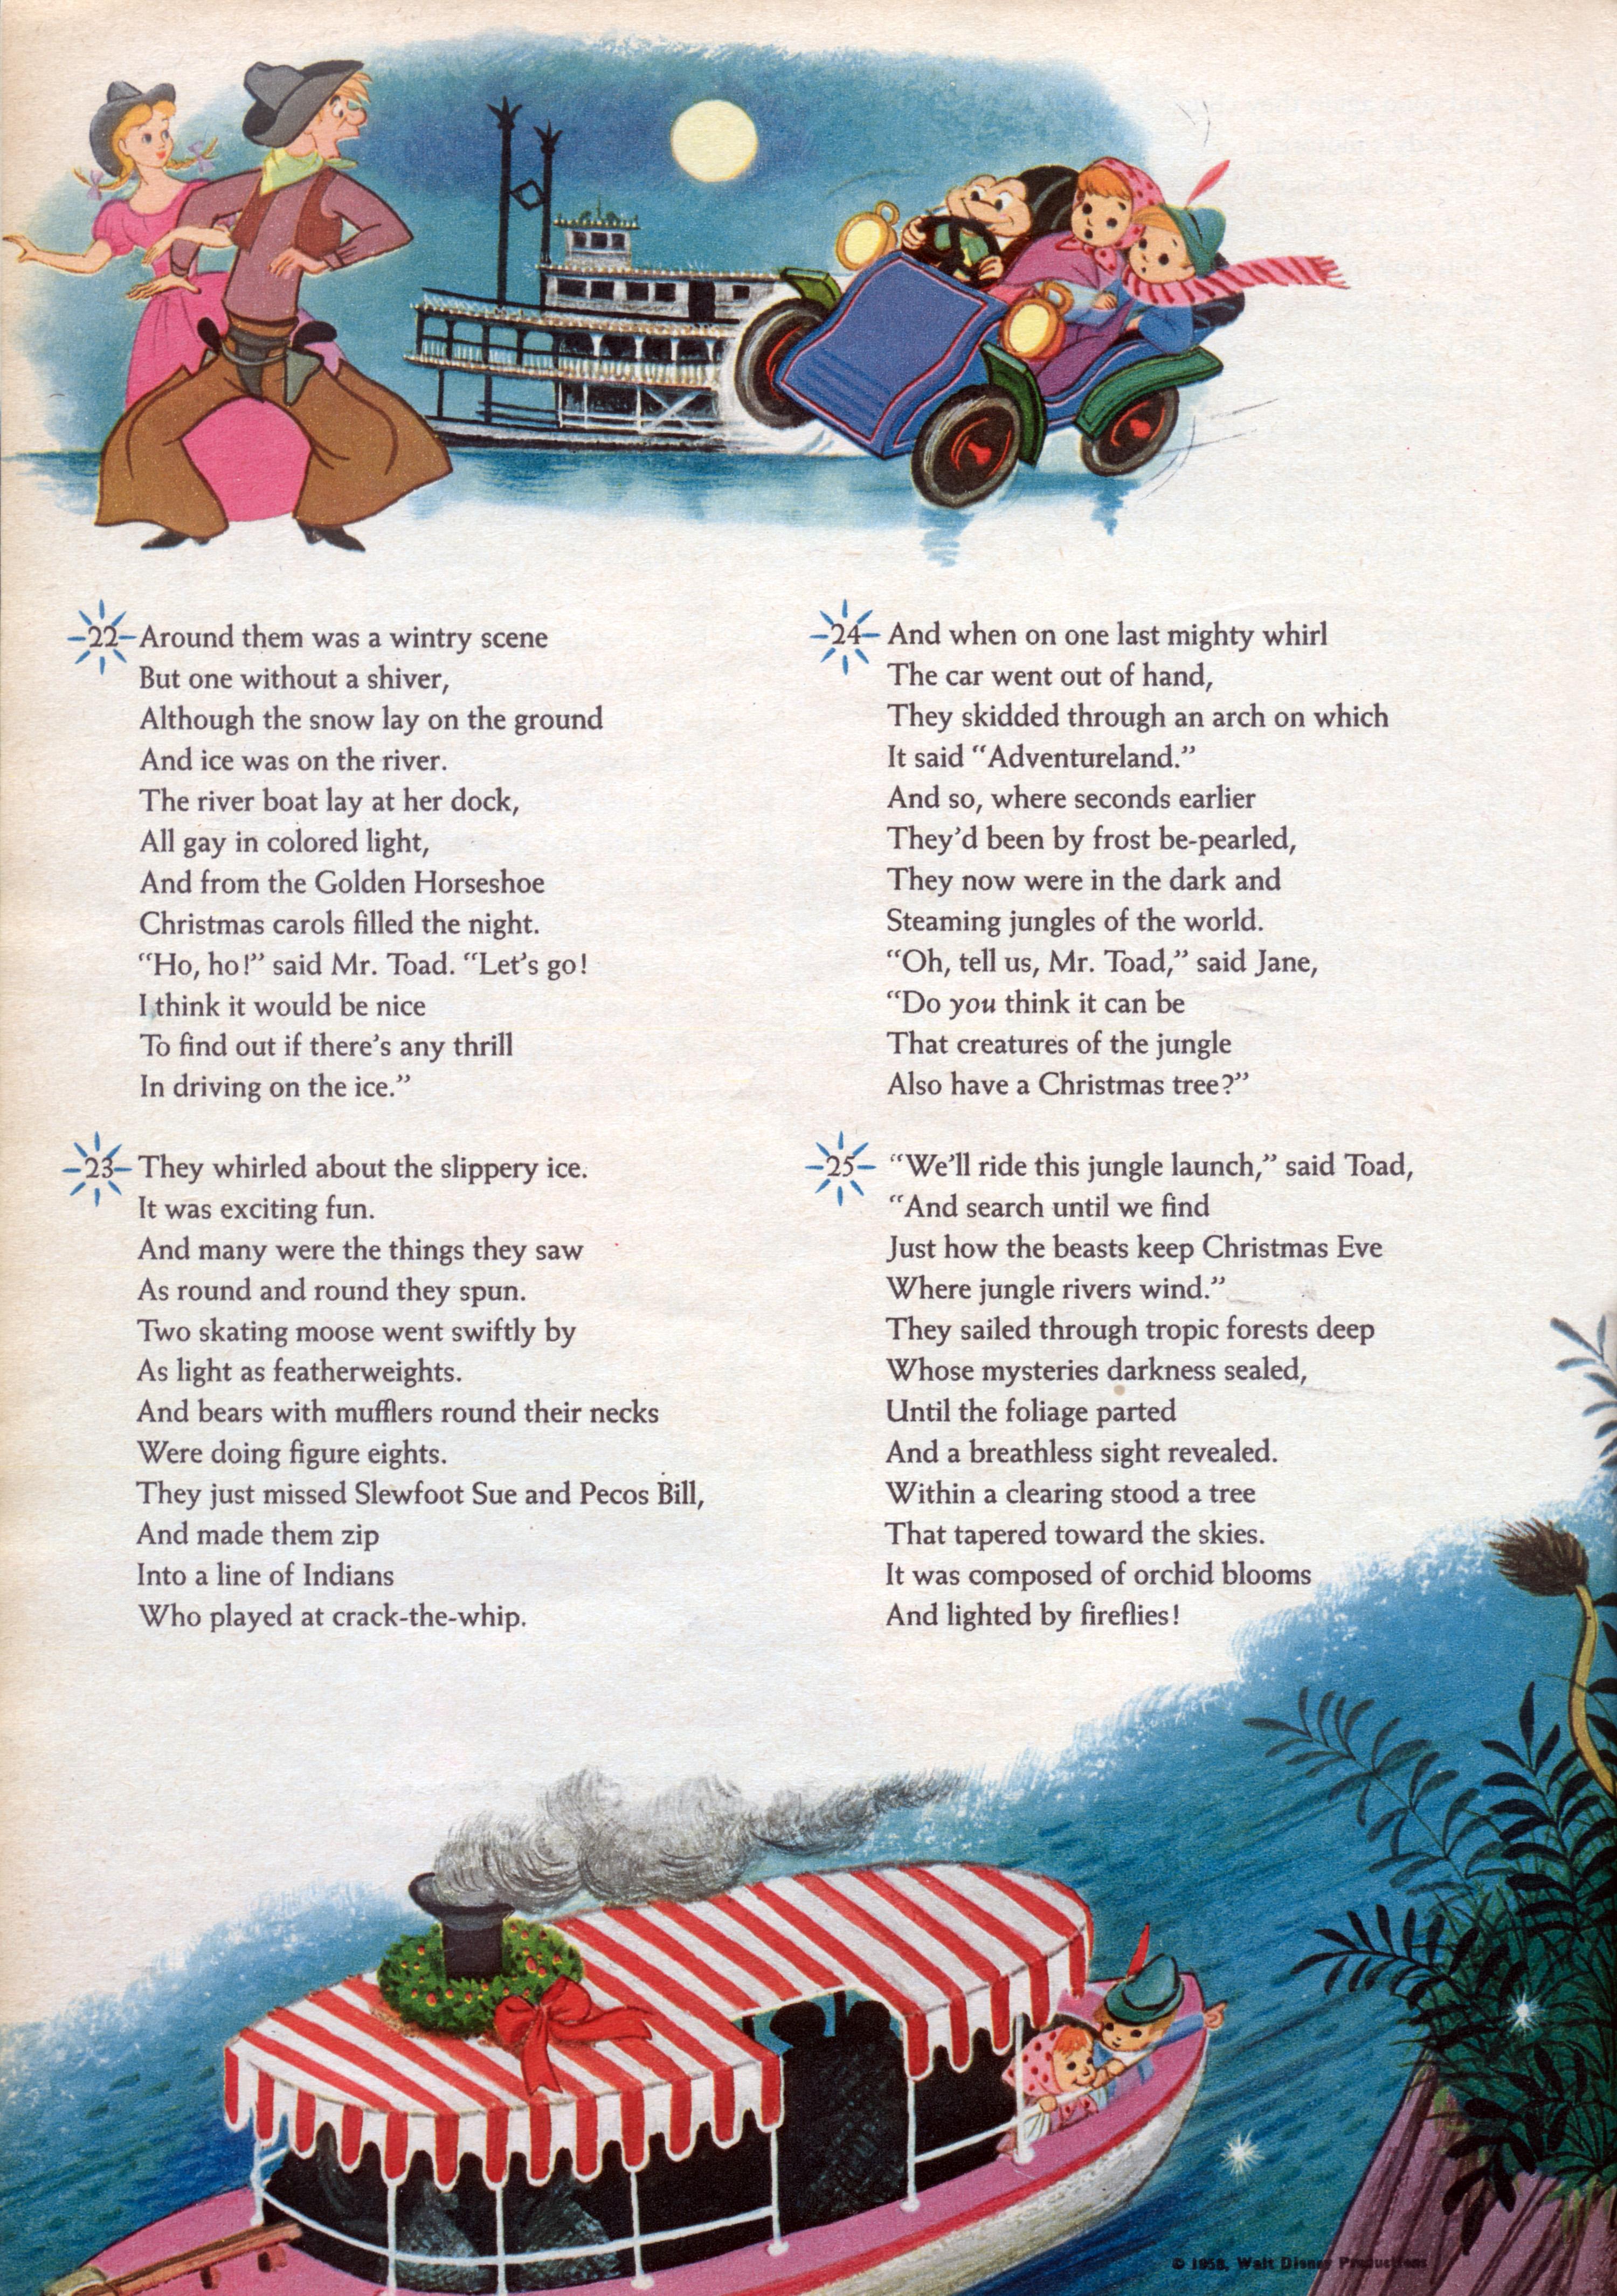 Merry Christmas From Progress City « Progress City, U.S.A.